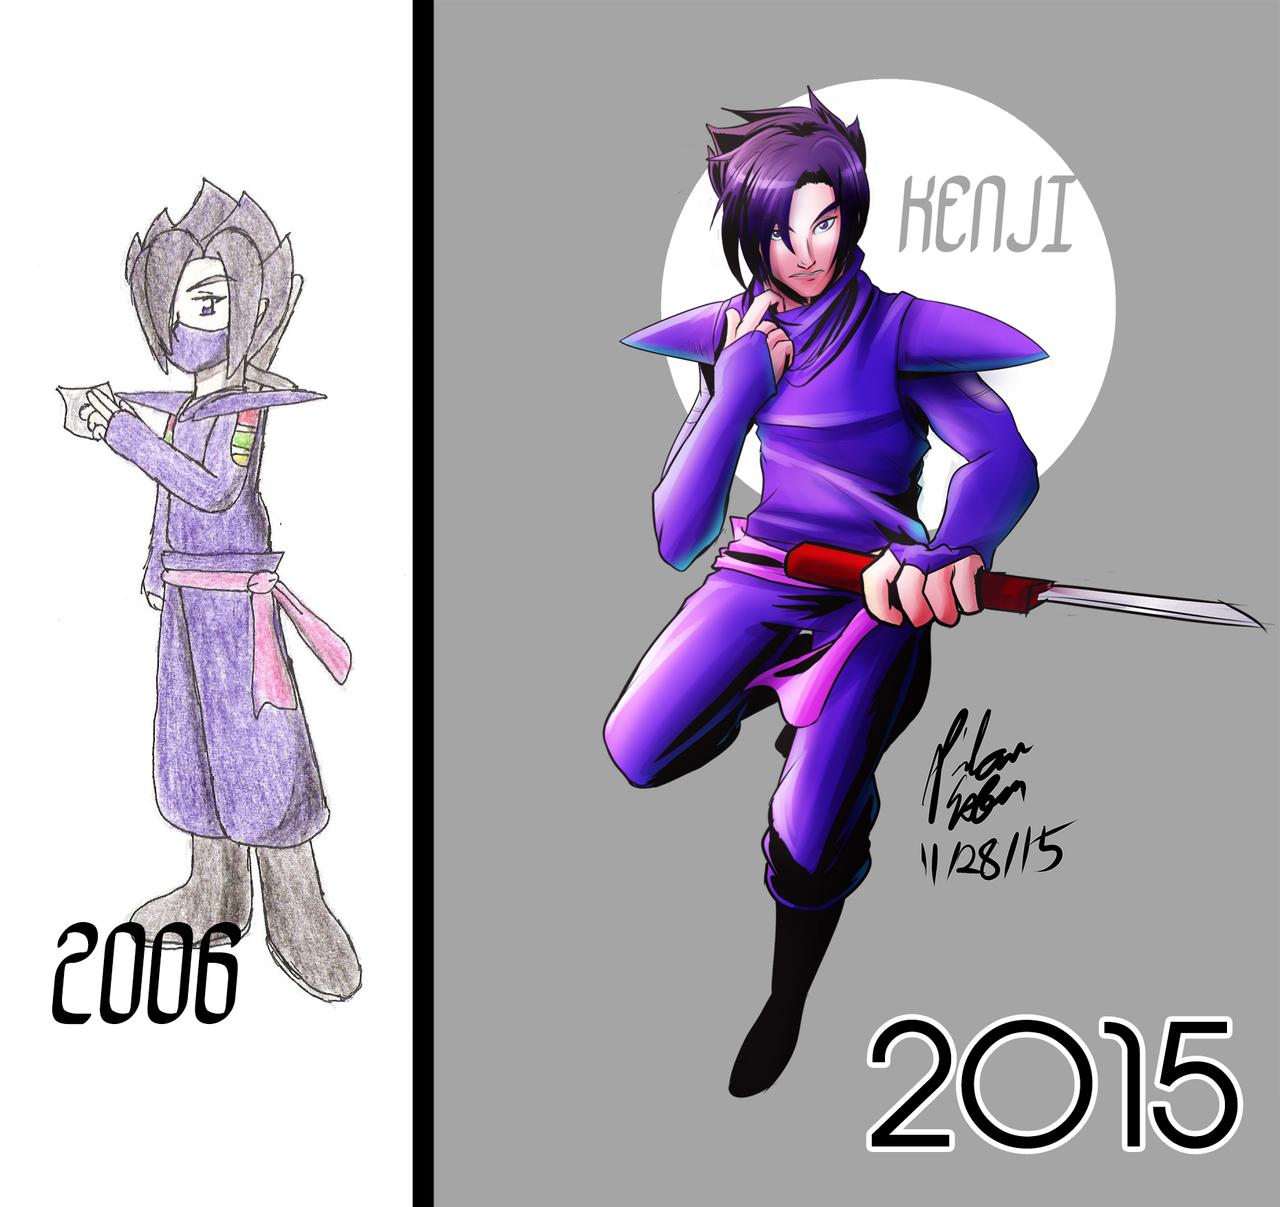 Kenji: 2006 VS 2015 by witch-girl-pilar